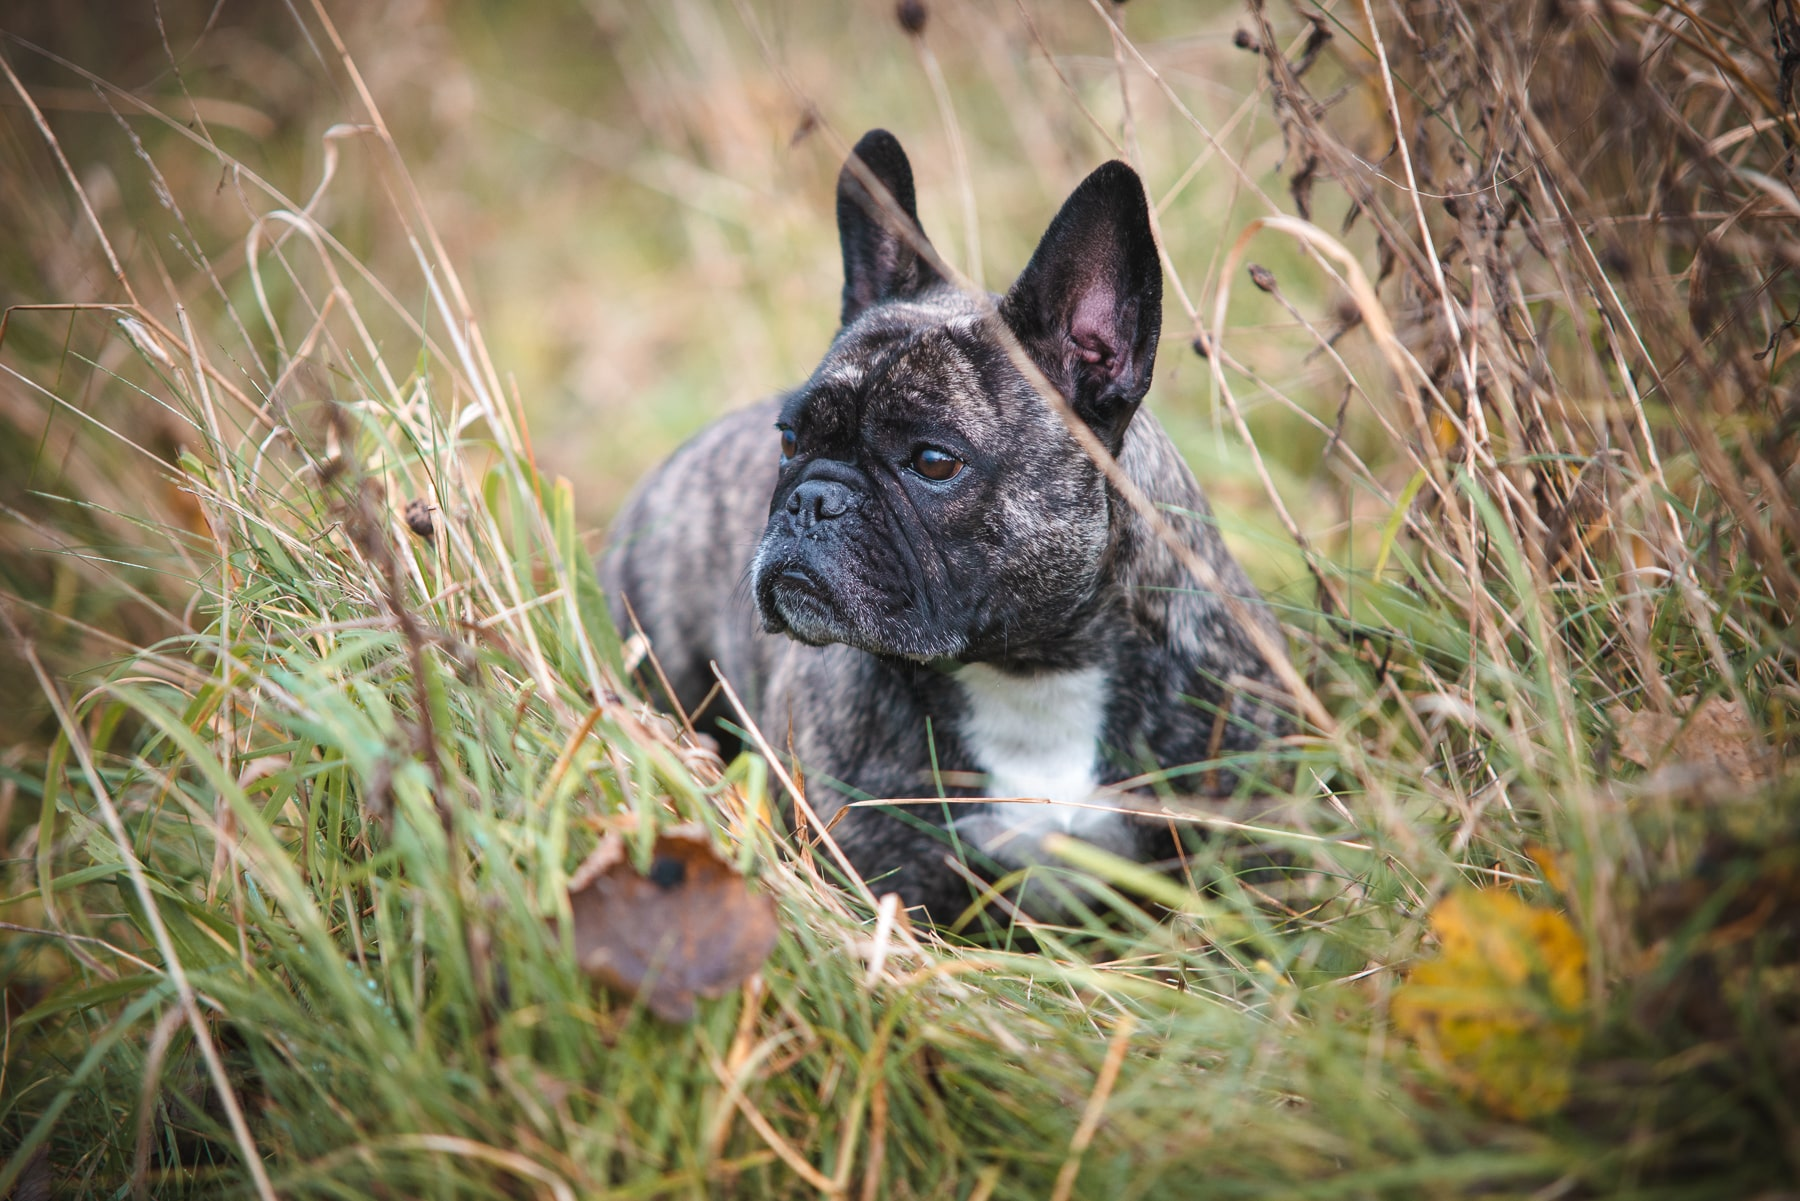 French bulldog among the tall autumn grass - Copyright 2018 Diffuse Photo